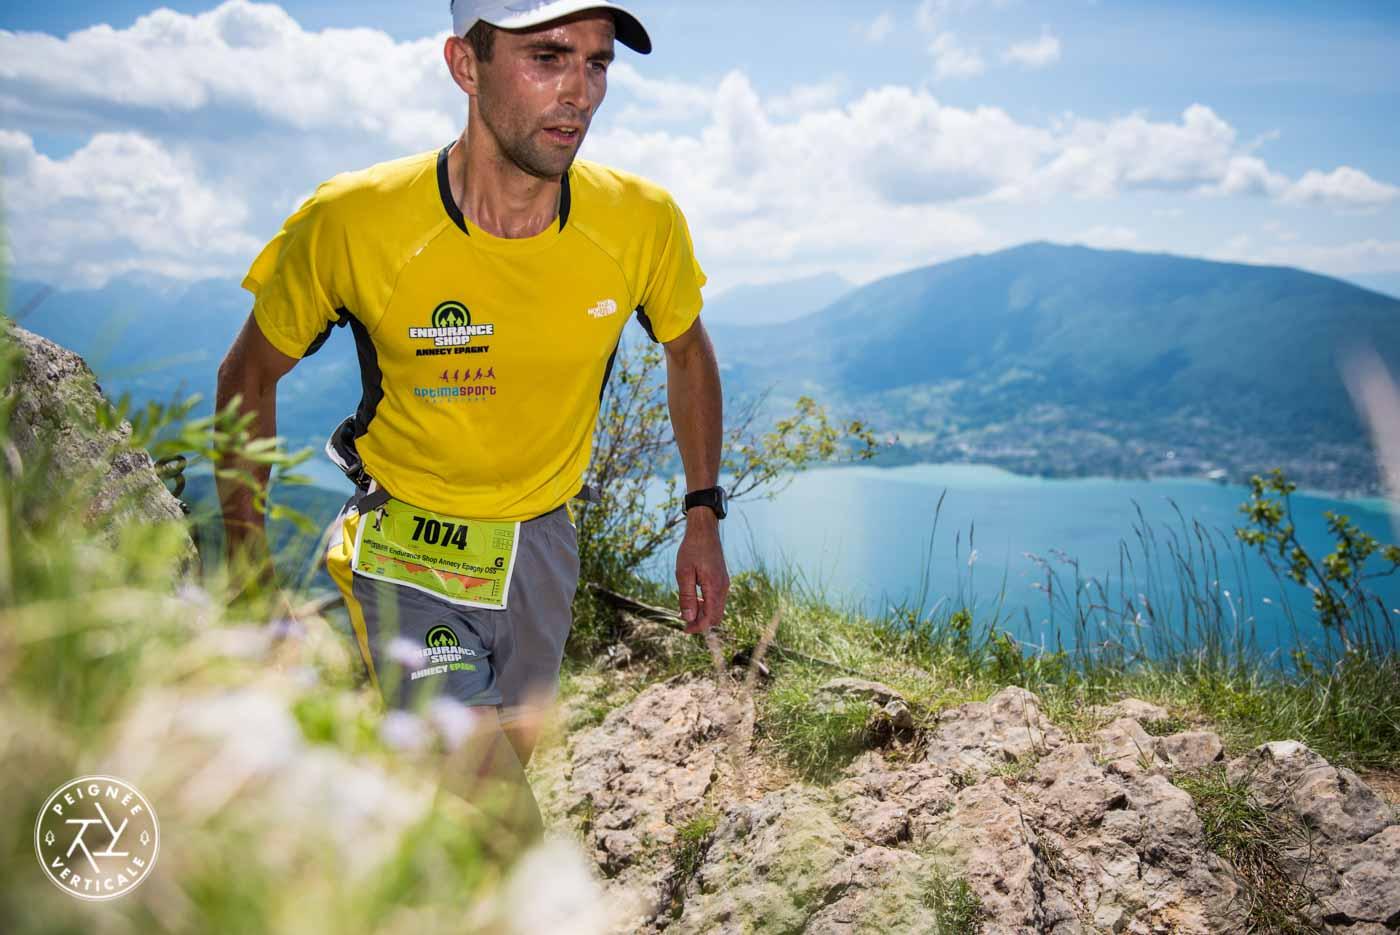 Clients-Maxi-Race-2015-Timothee-Nalet-Photographe-6379.jpg